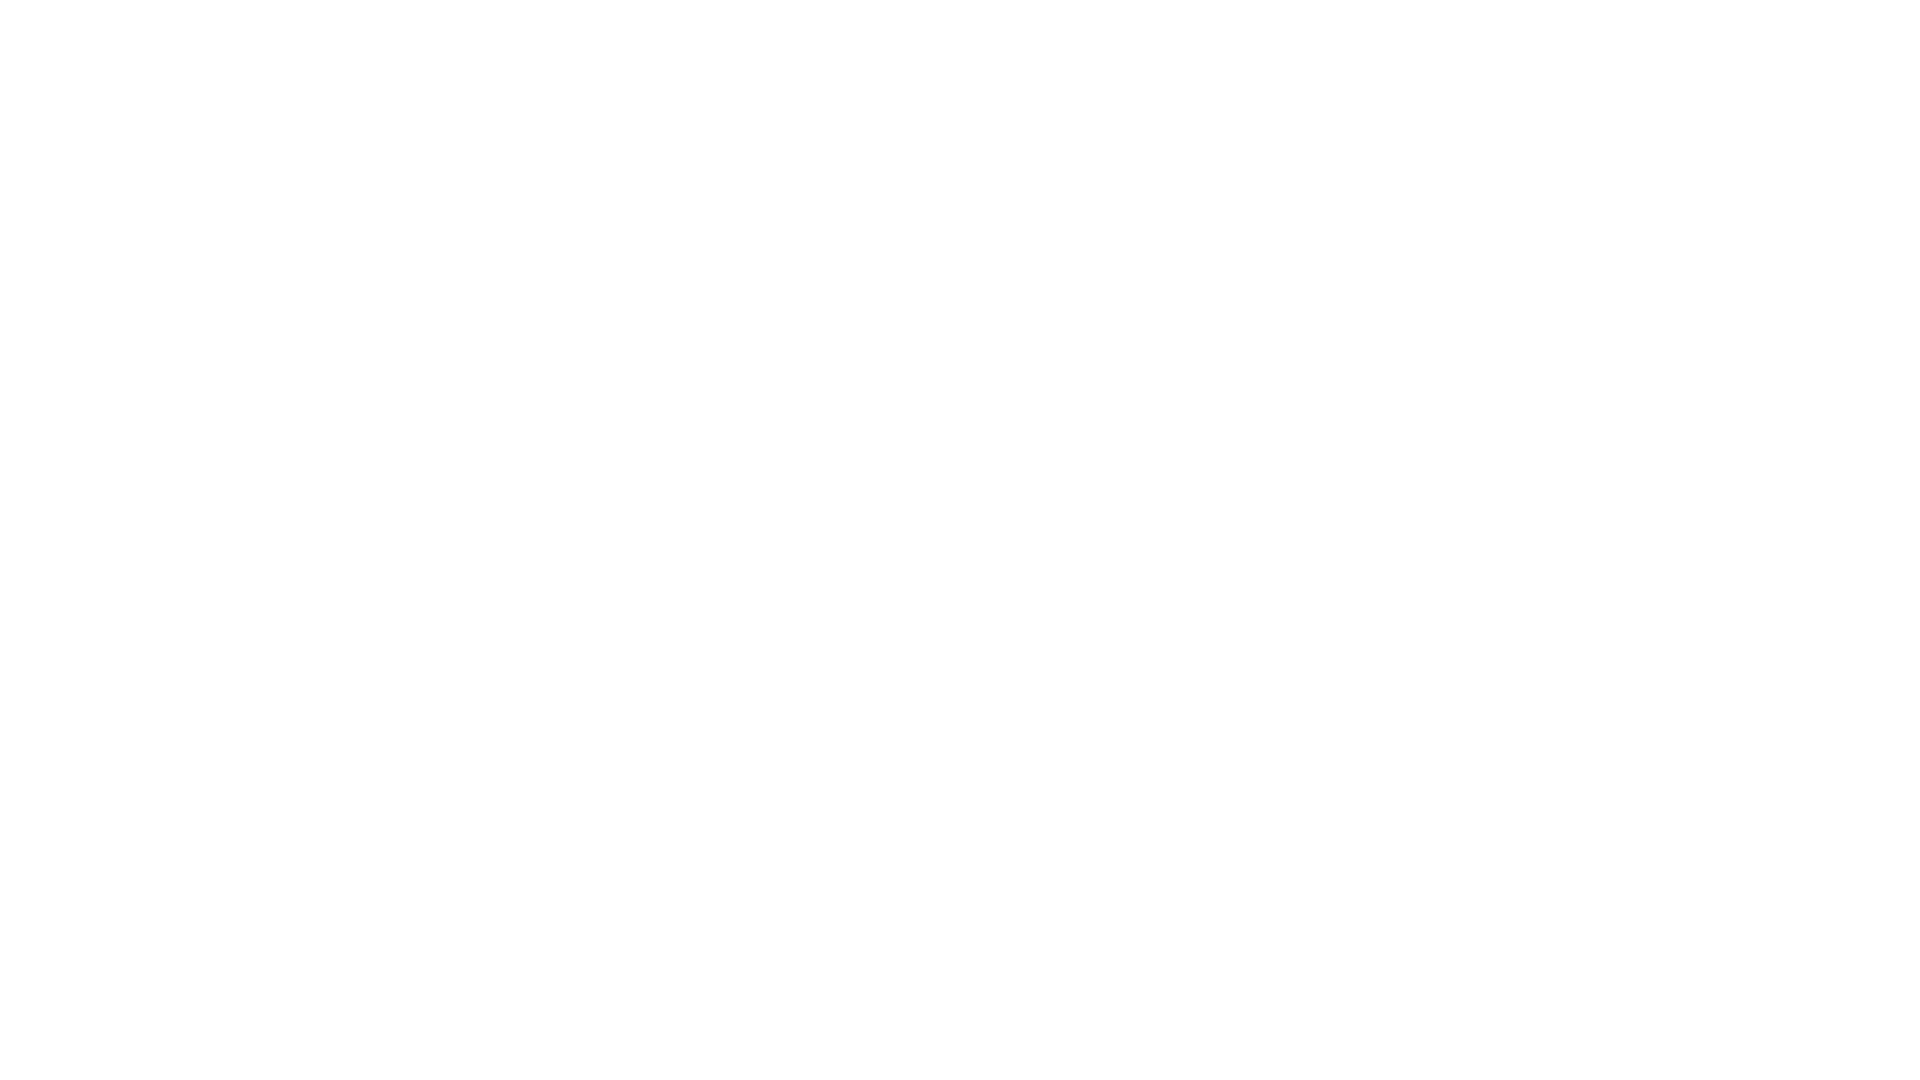 Community Kids Sign Up